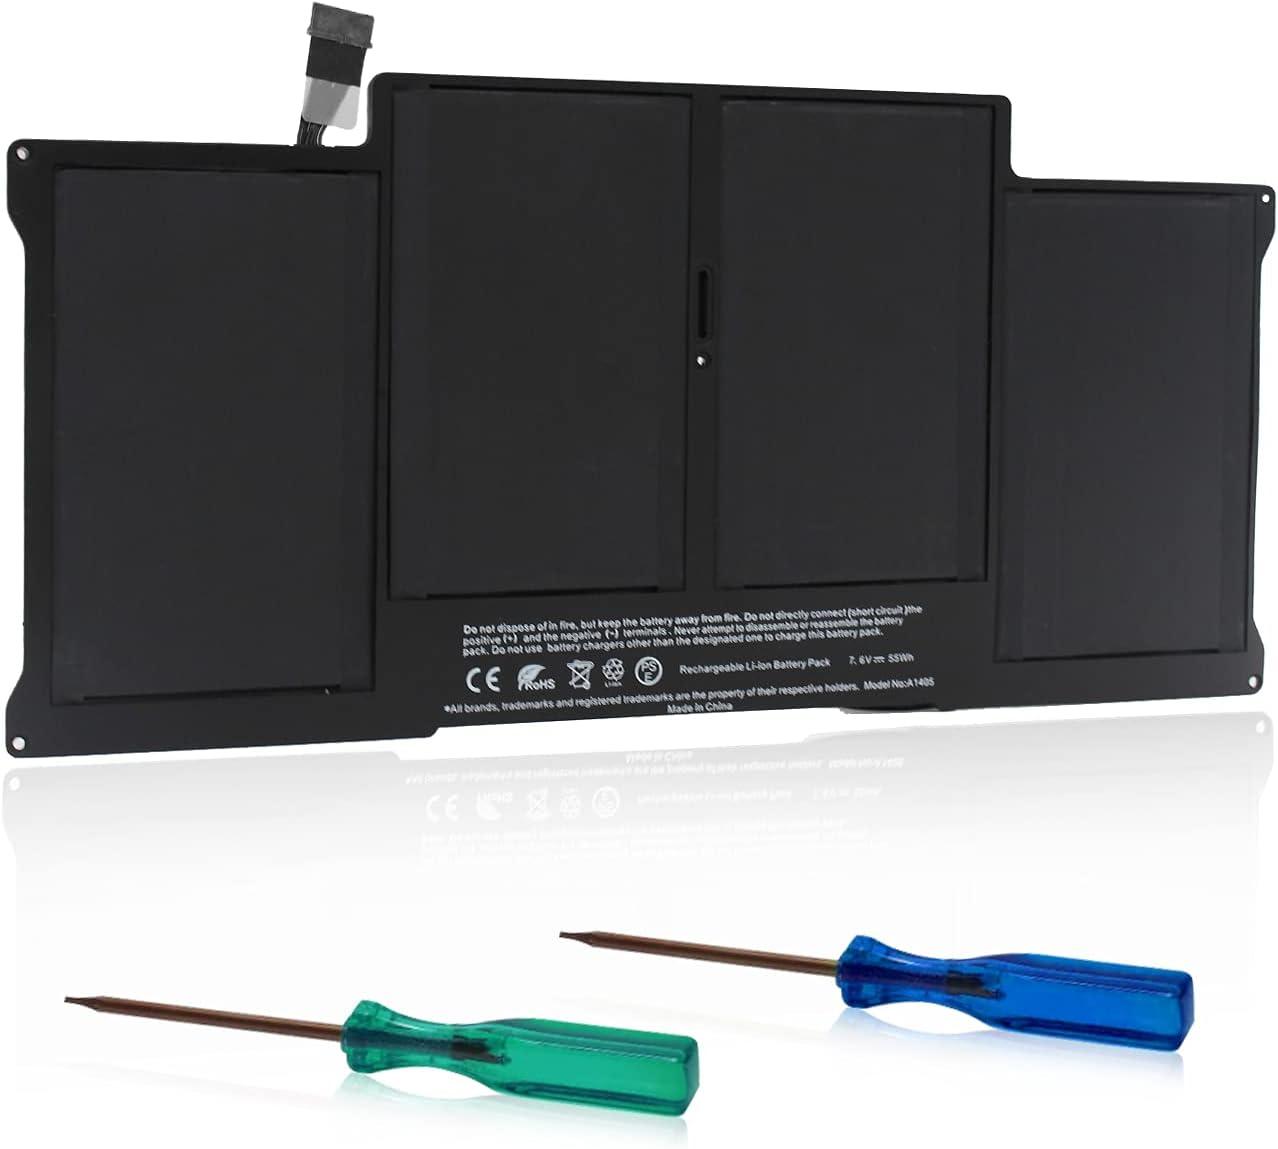 TECHOWL A1405 A1466 Battery for 13 inch MacBook Air Battery A1466 Replacement Battery for MacBook Air A1466 A1369 - [Applicable Laptop:A1466/A1369,MacBook Air,13-inch,2010-2017]